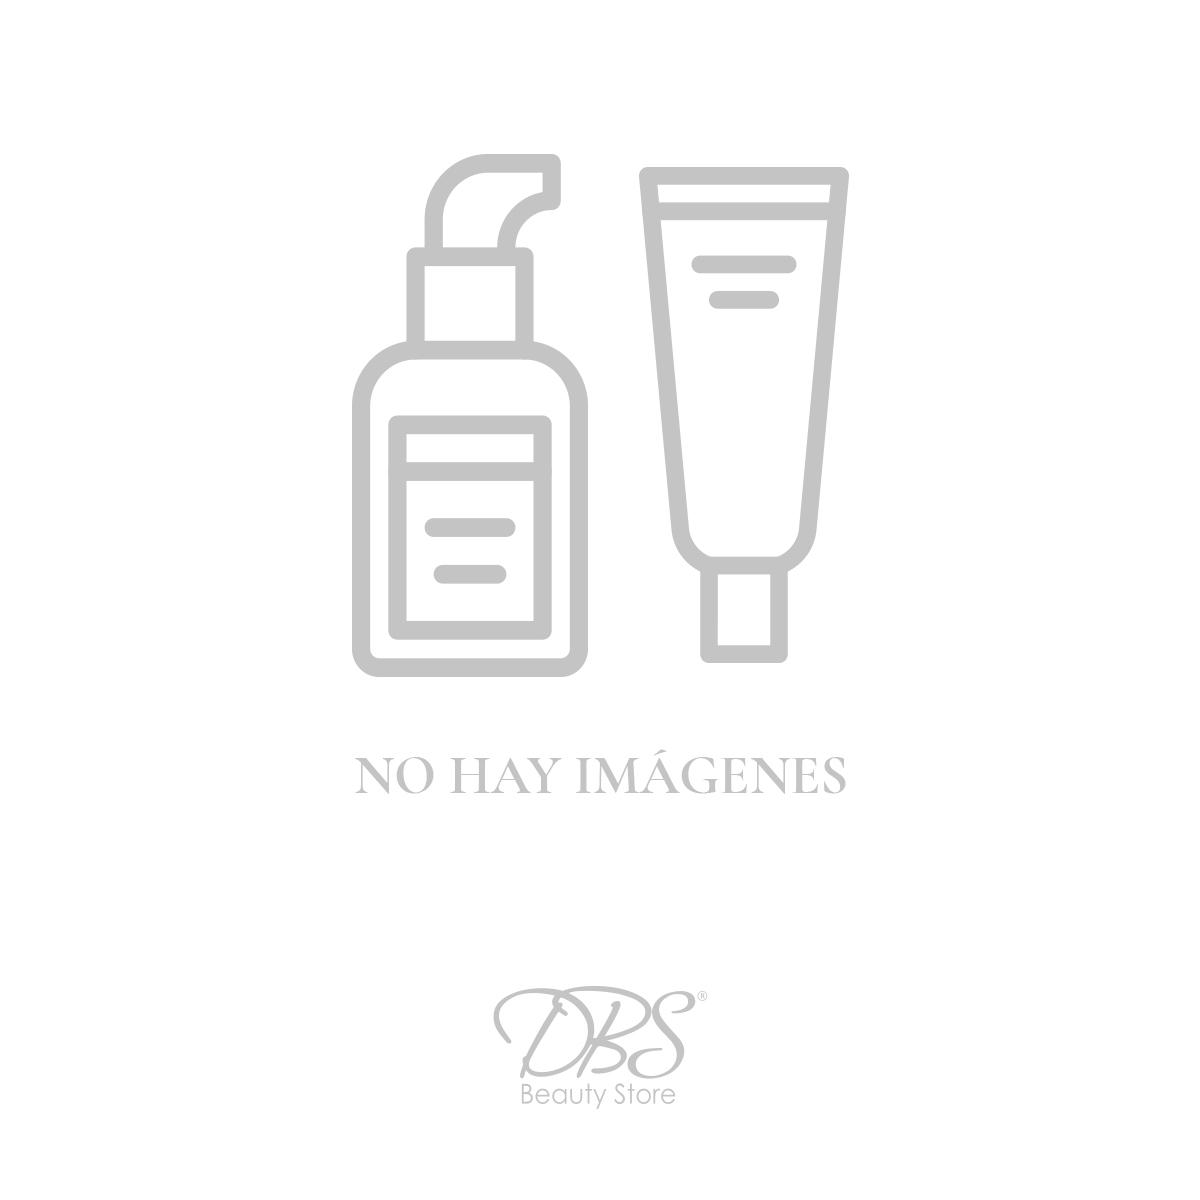 body-luxuries-BL-BN06641.jpg